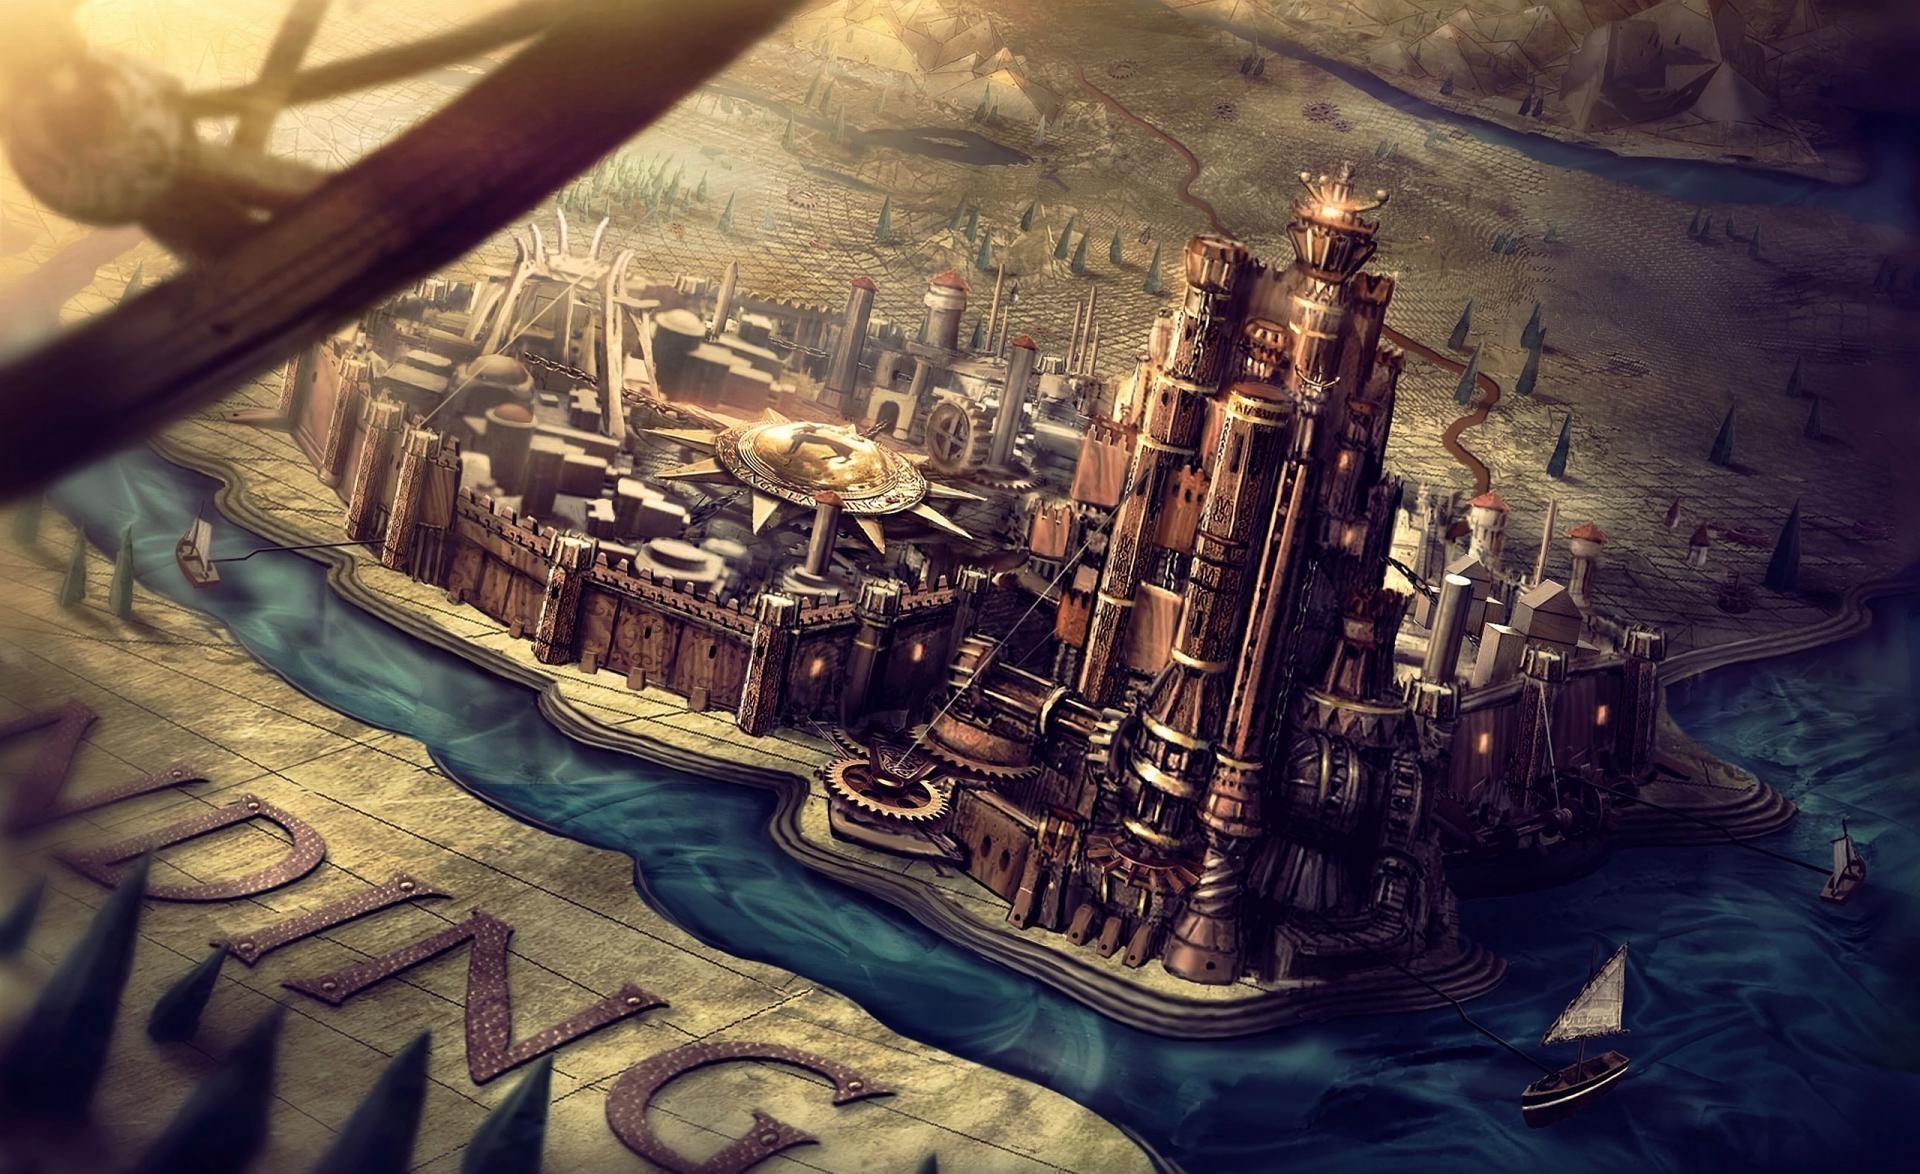 TV Show - Game Of Thrones  King's Landing Wallpaper